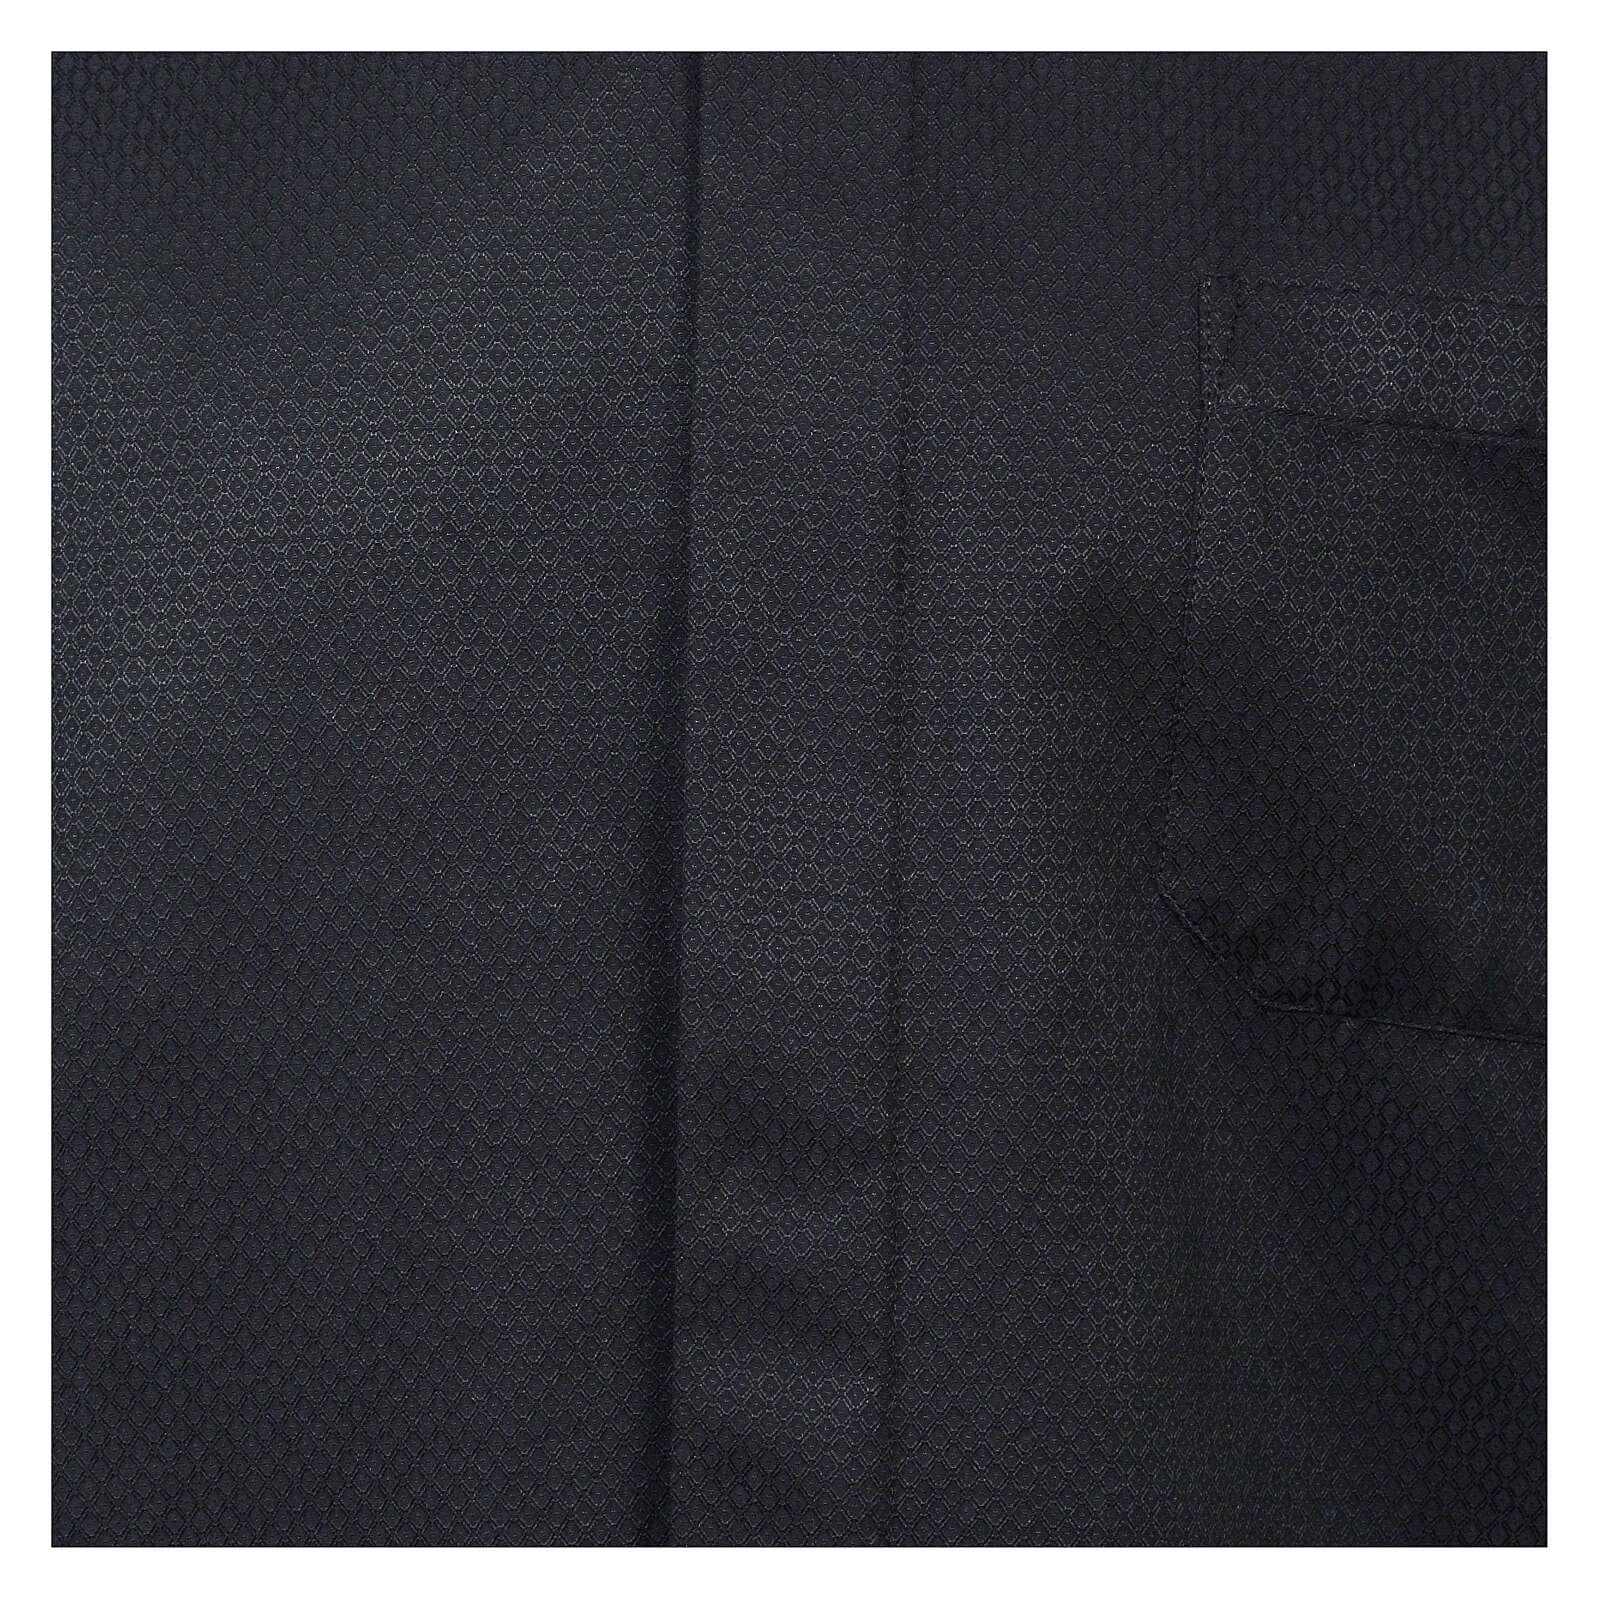 Camisa clergy diamantino nero seda Manga Larga 4